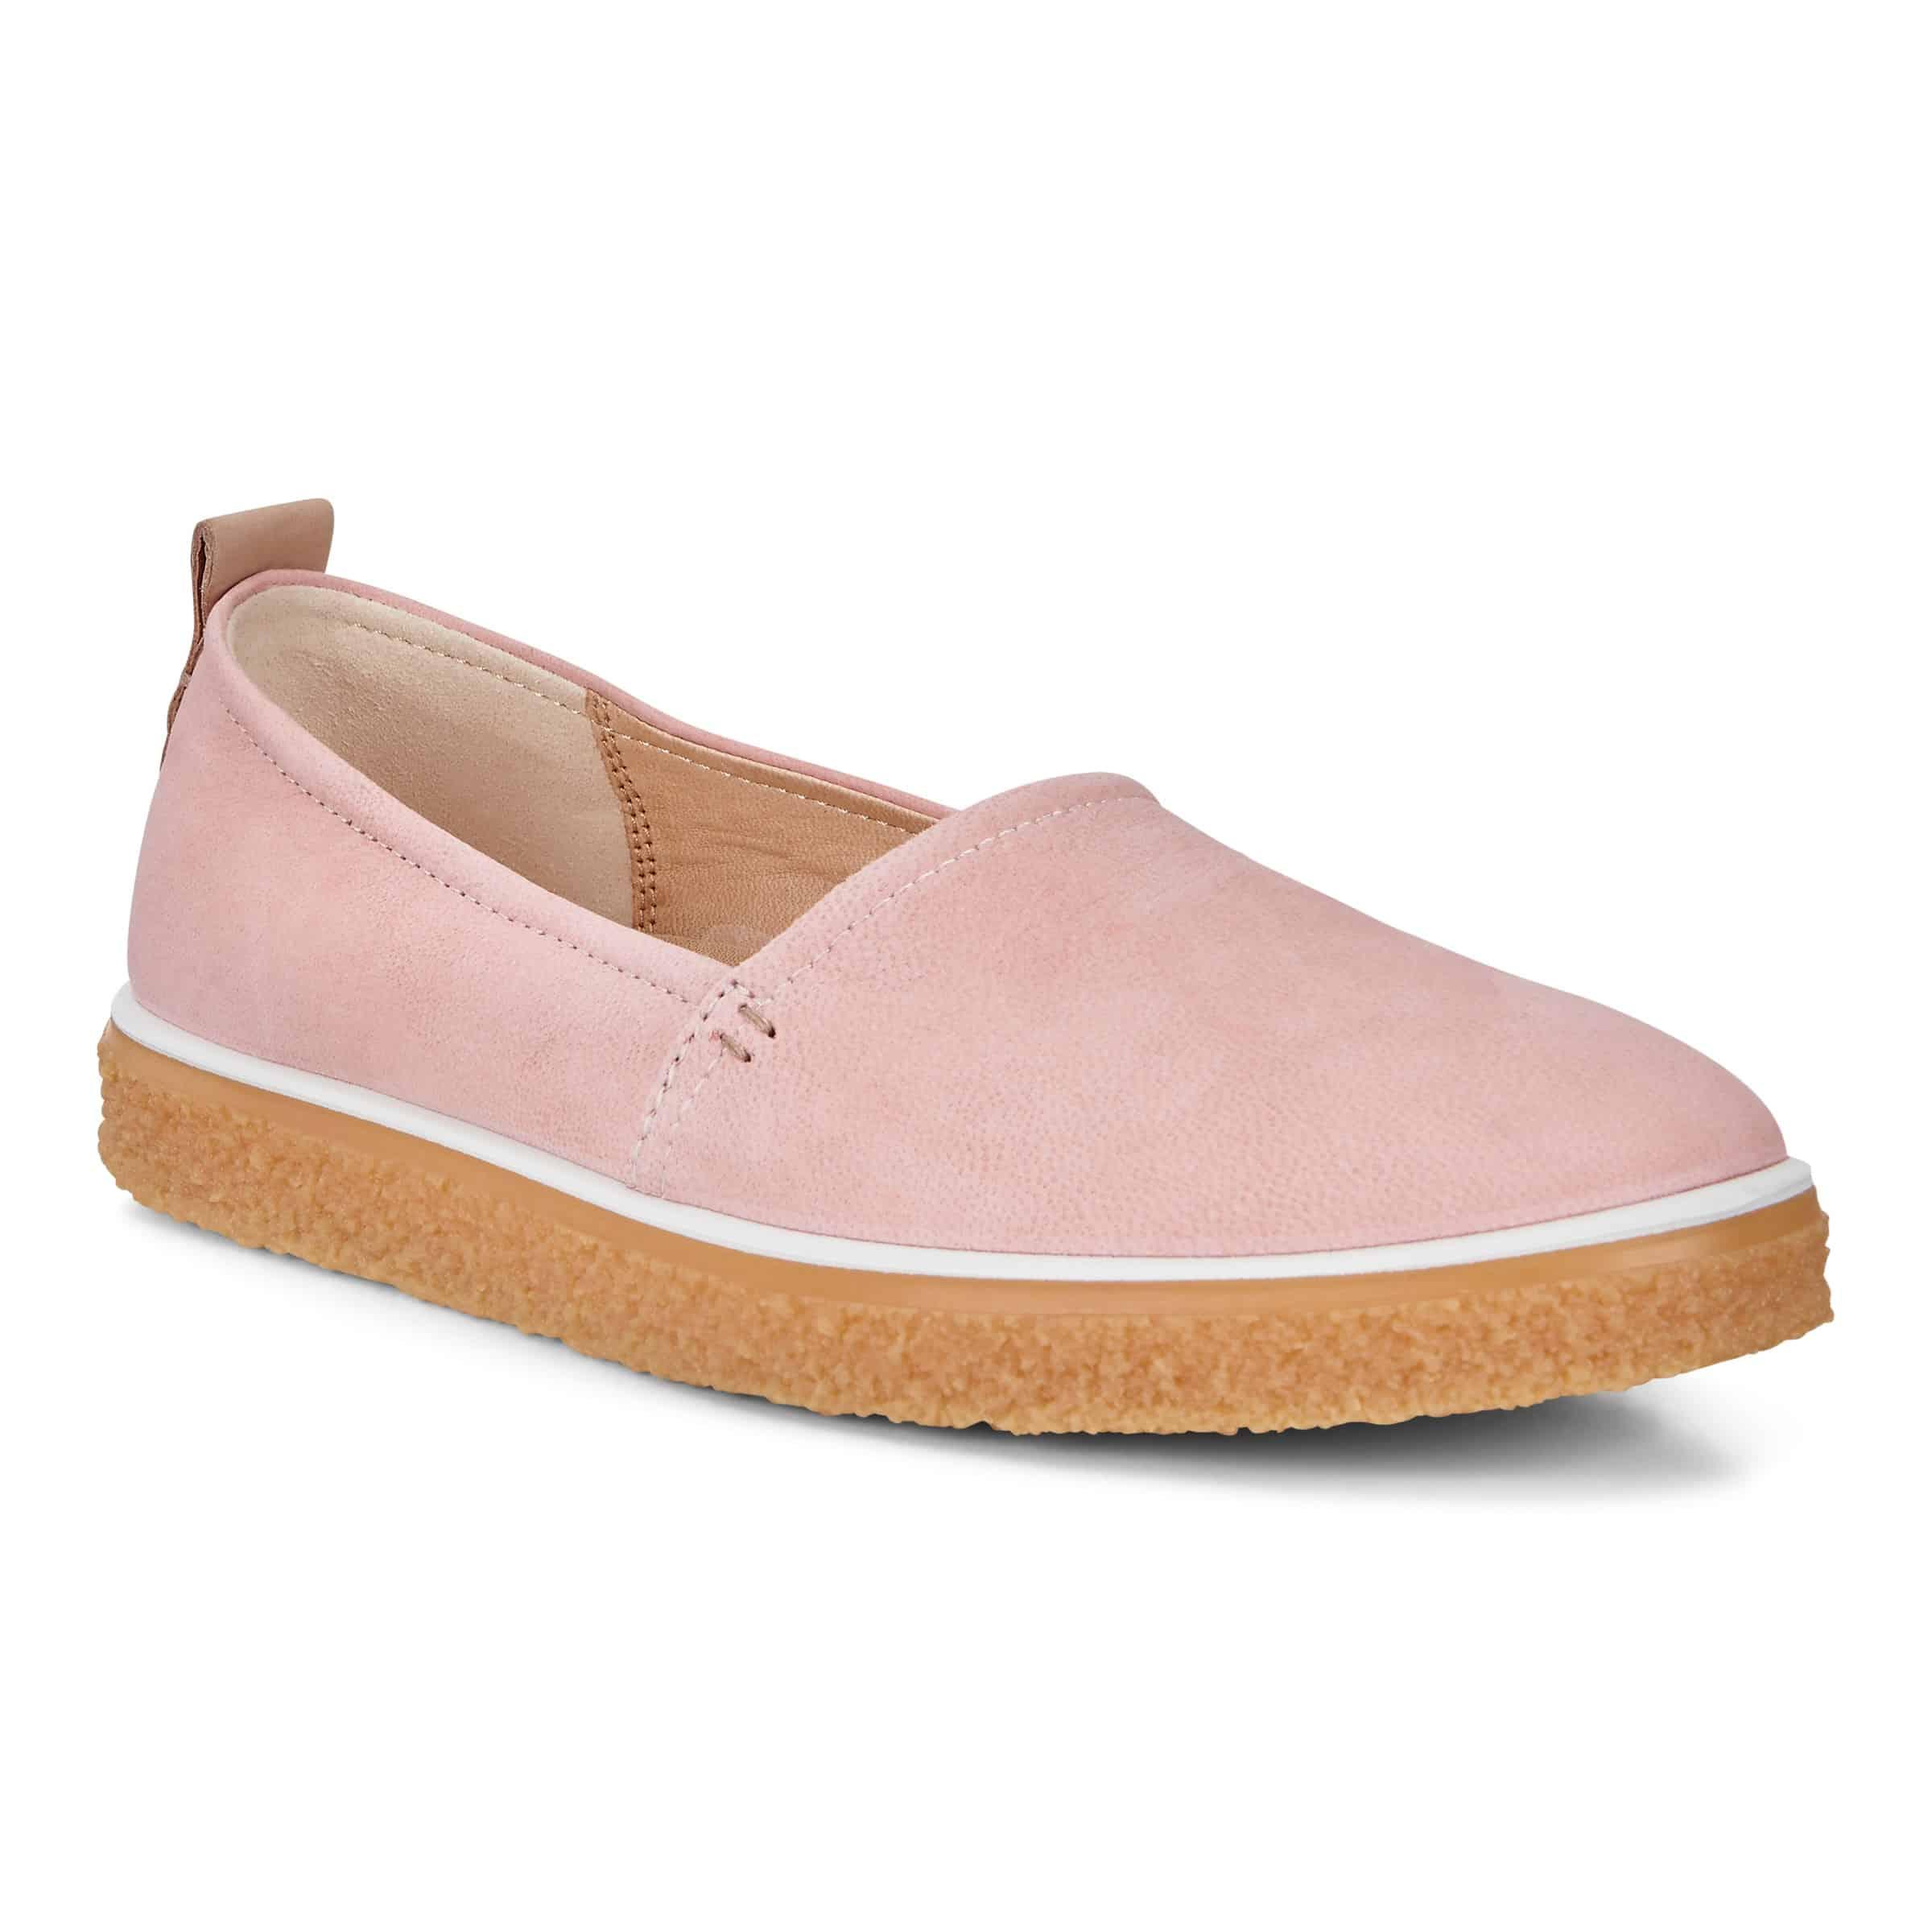 09cf2db48cf8 ECCO CREPETRAY - 121 Shoes